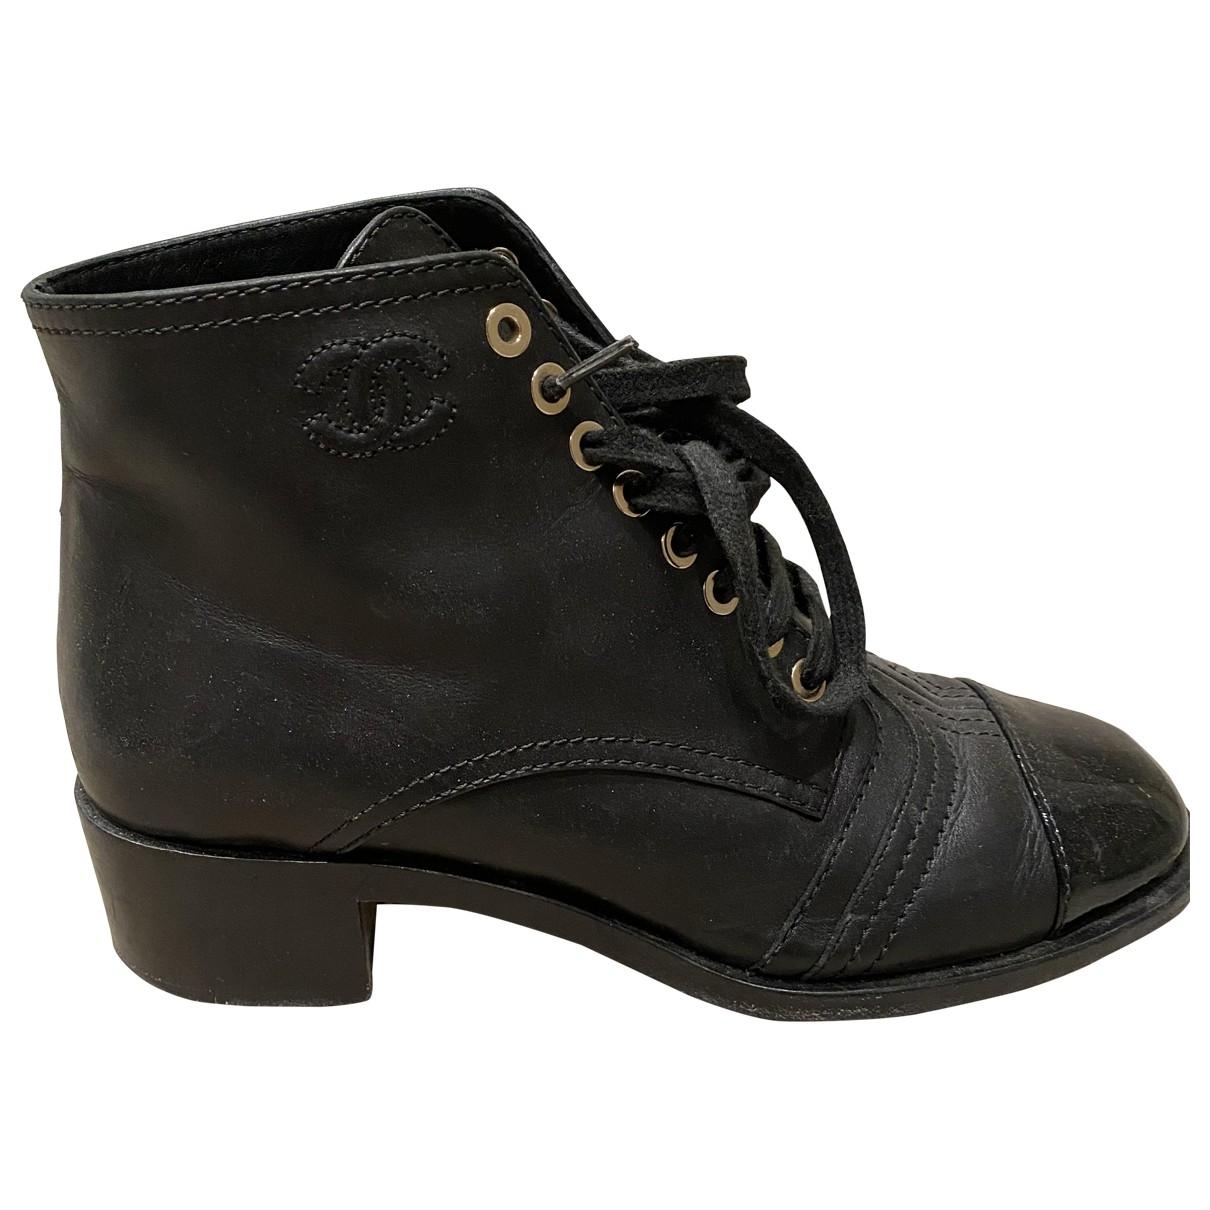 Chanel \N Stiefeletten in  Schwarz Leder